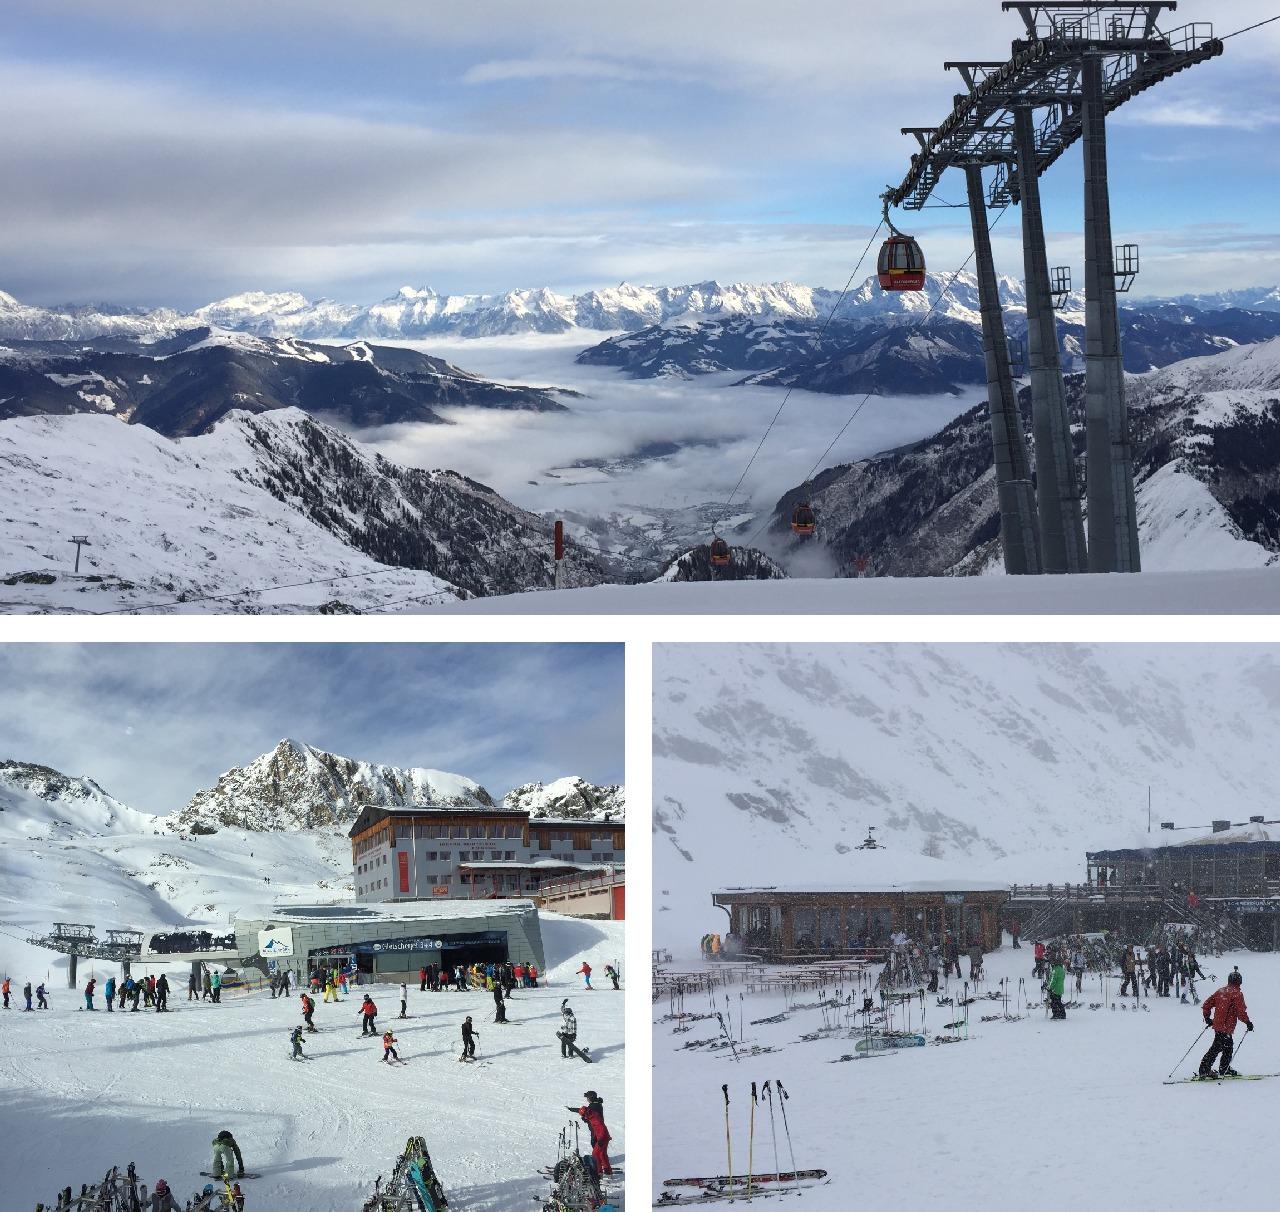 Ascensiune pe ghetarul Kitzsteinhorn cu Gletscherjet 1 + 2